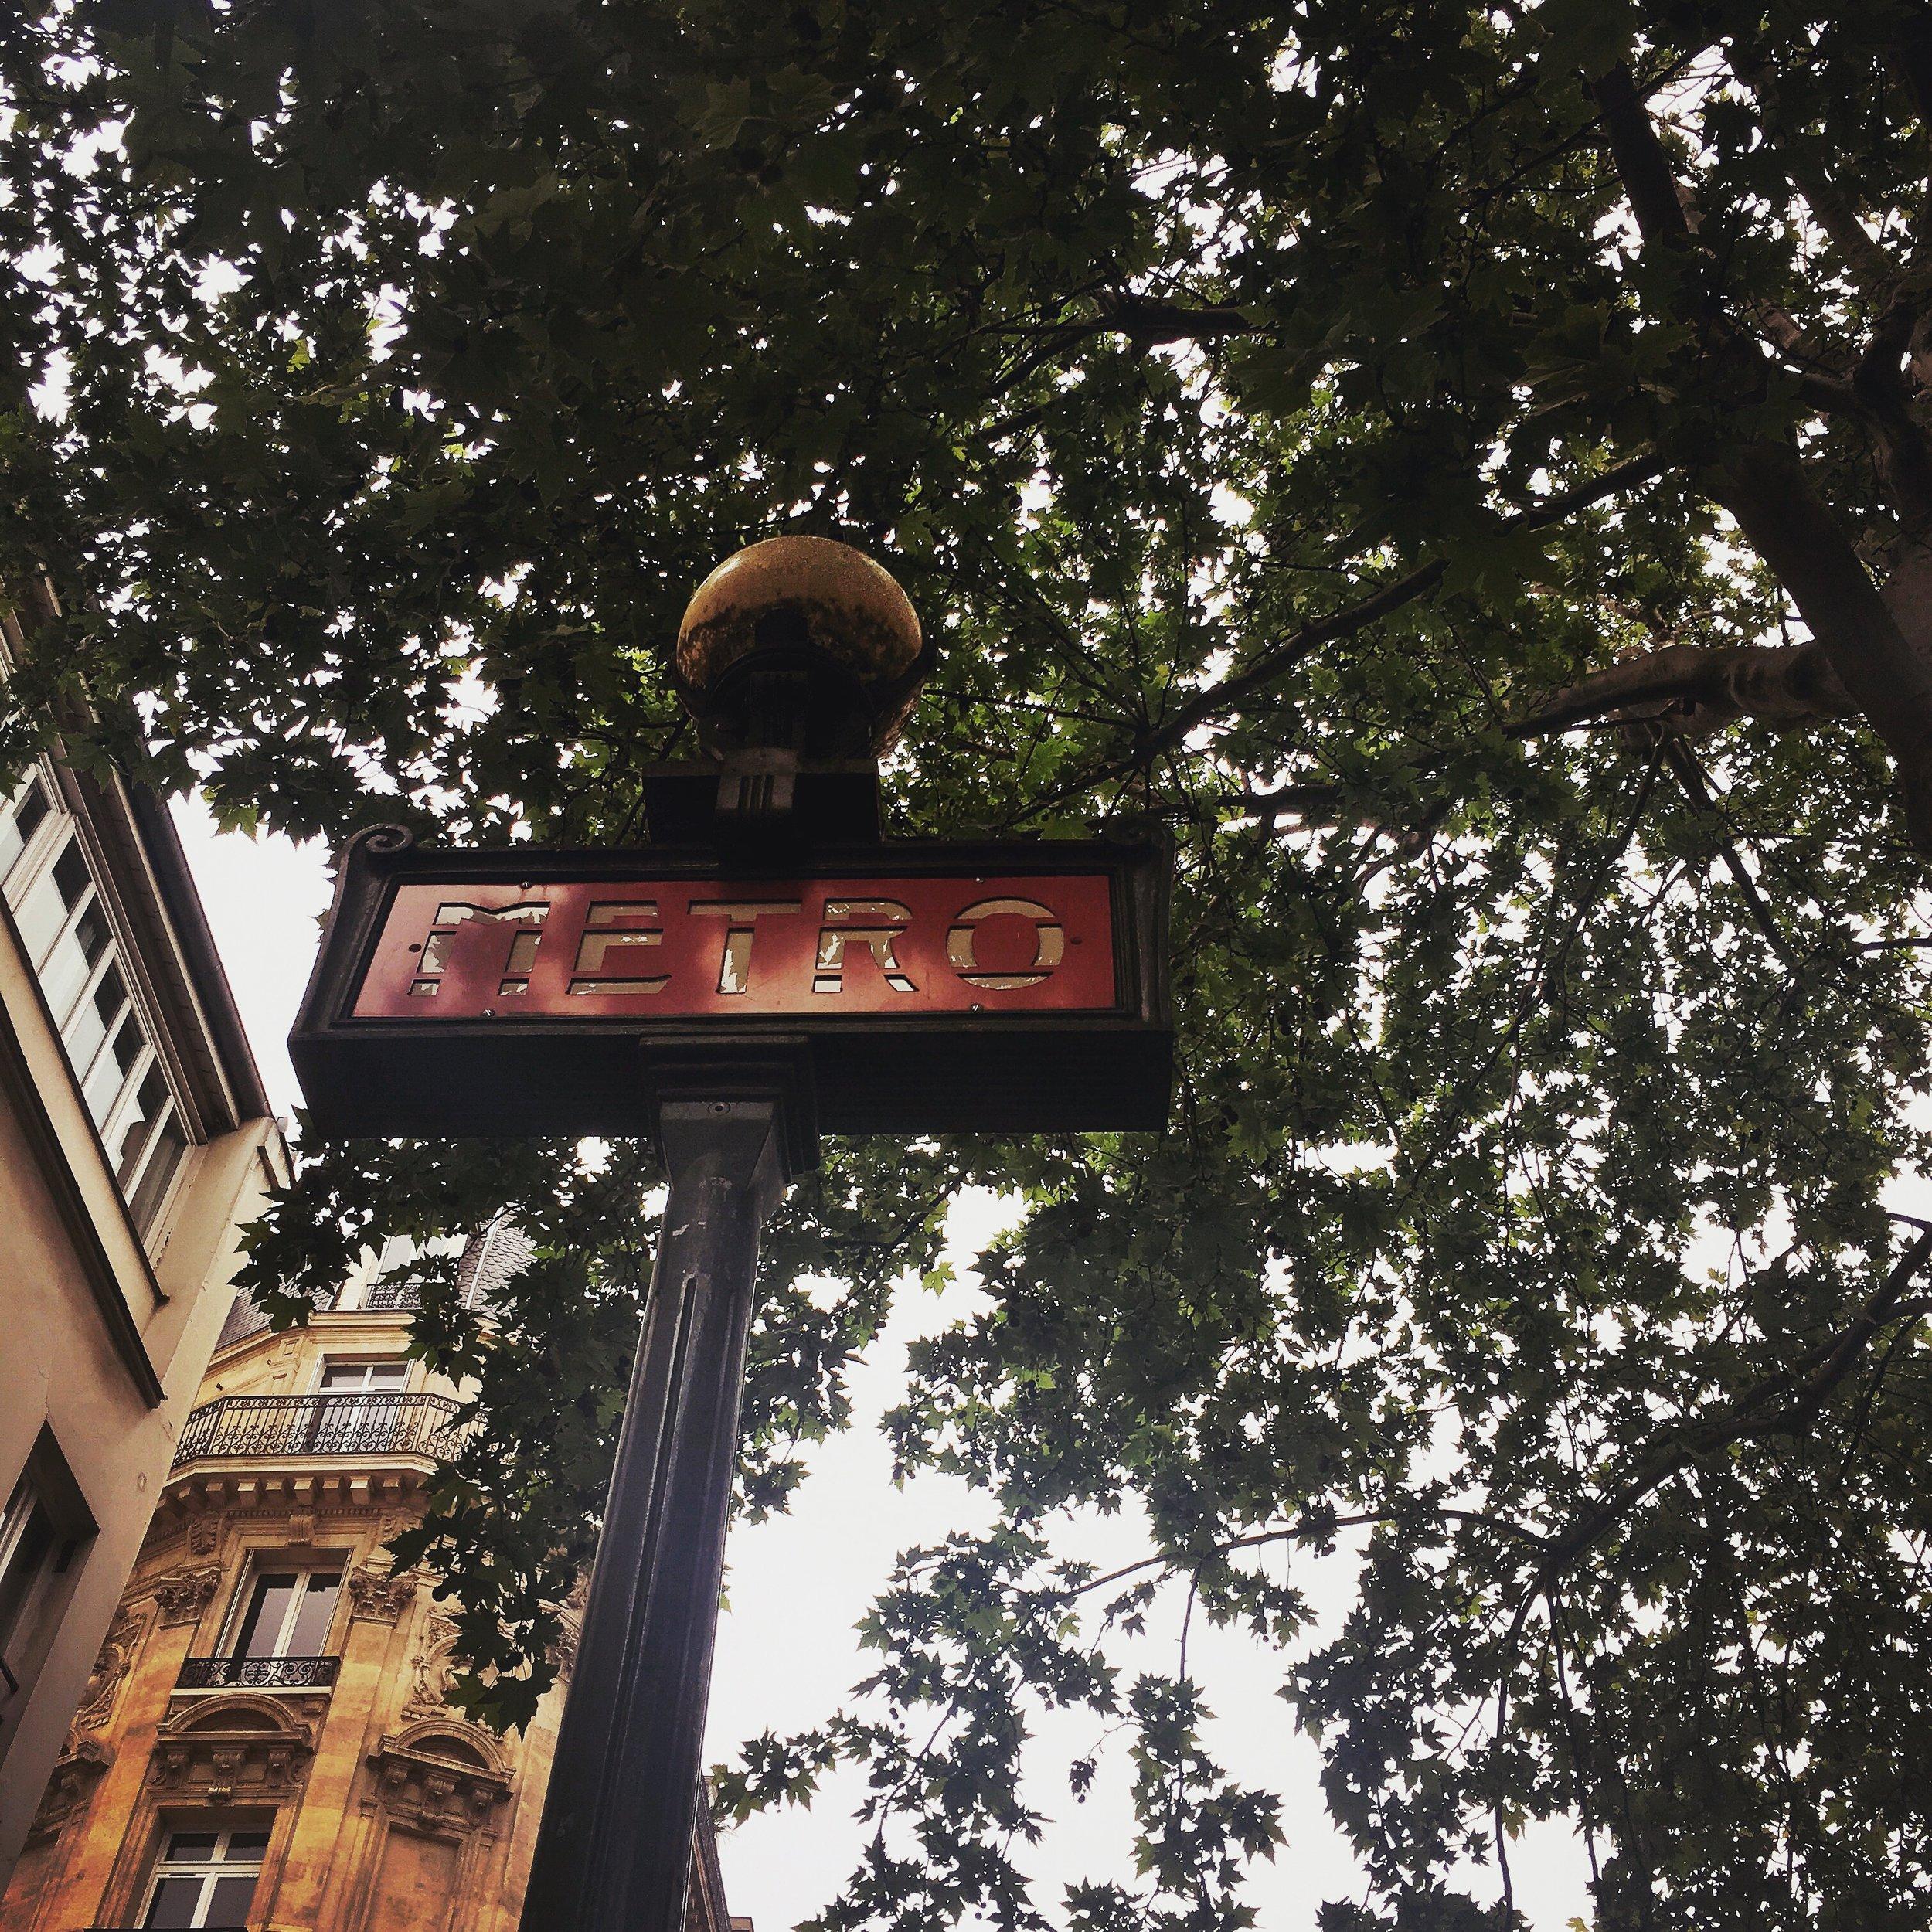 Lozidaze_Paris-Metro_01